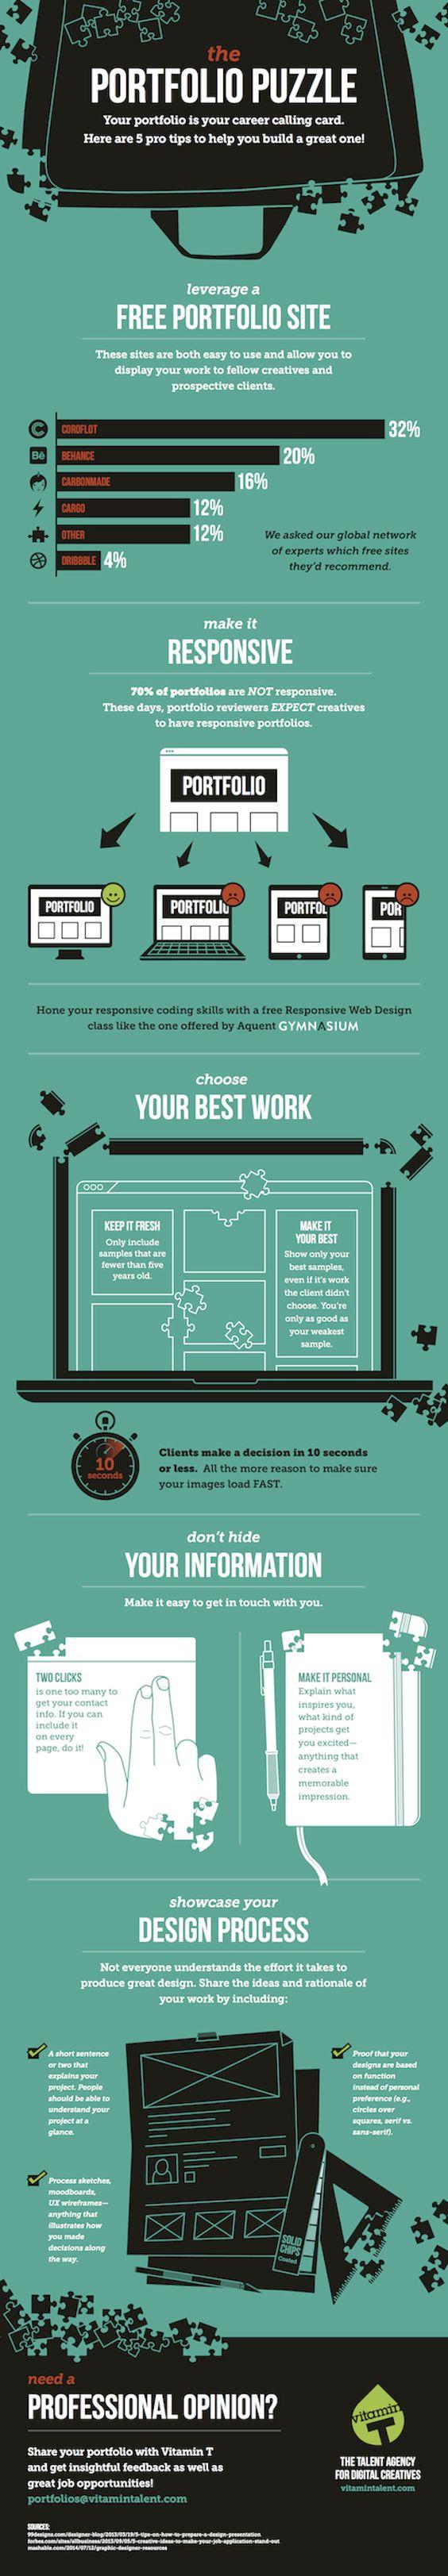 Infographic: Five Tips On Creating A Great Design Portfolio - DesignTAXI.com